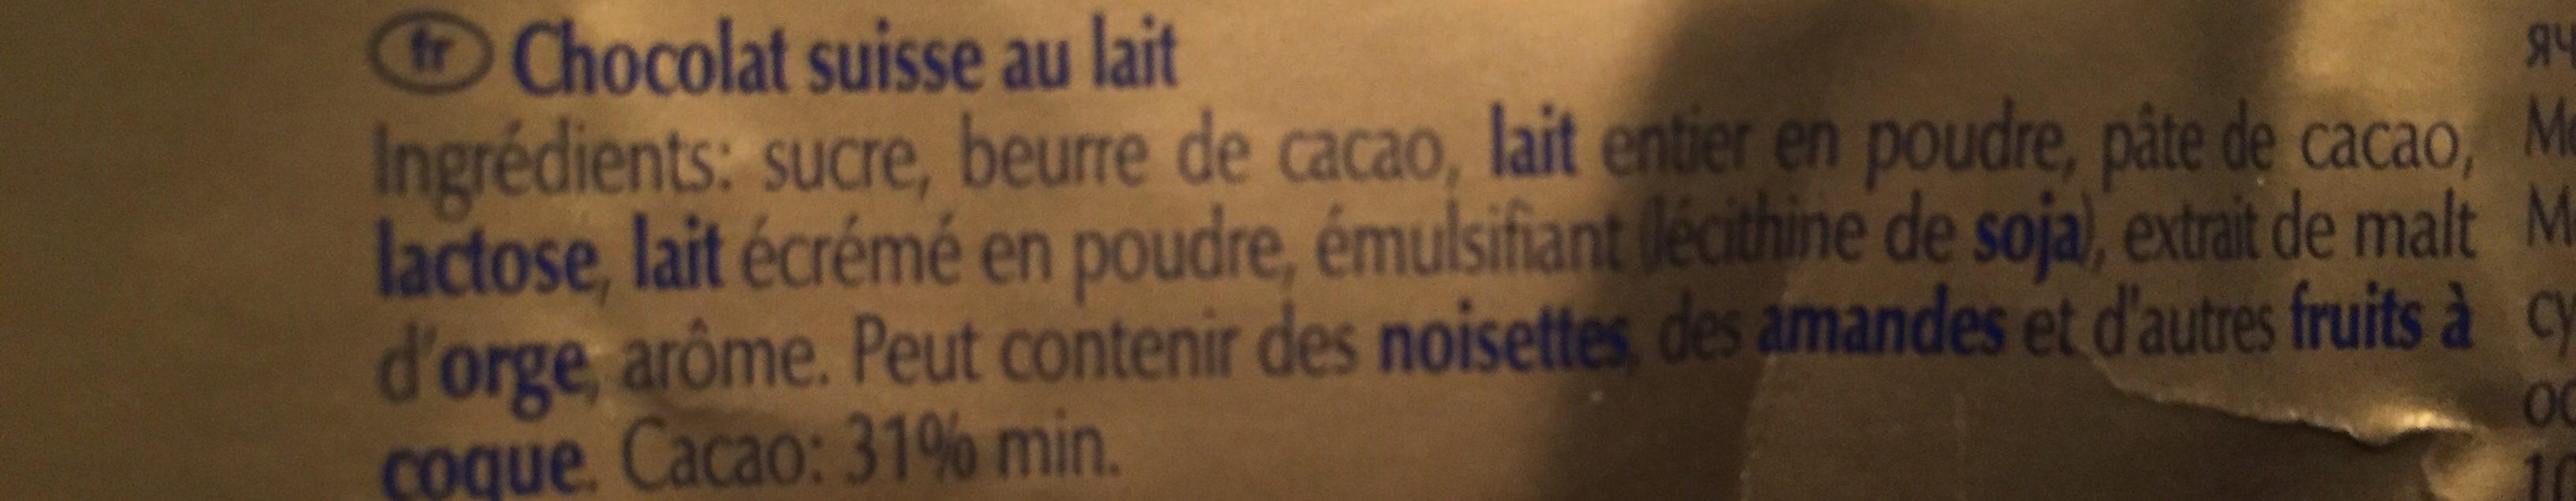 Swiss premium chocolate - Extra au lait - Ingredienti - fr